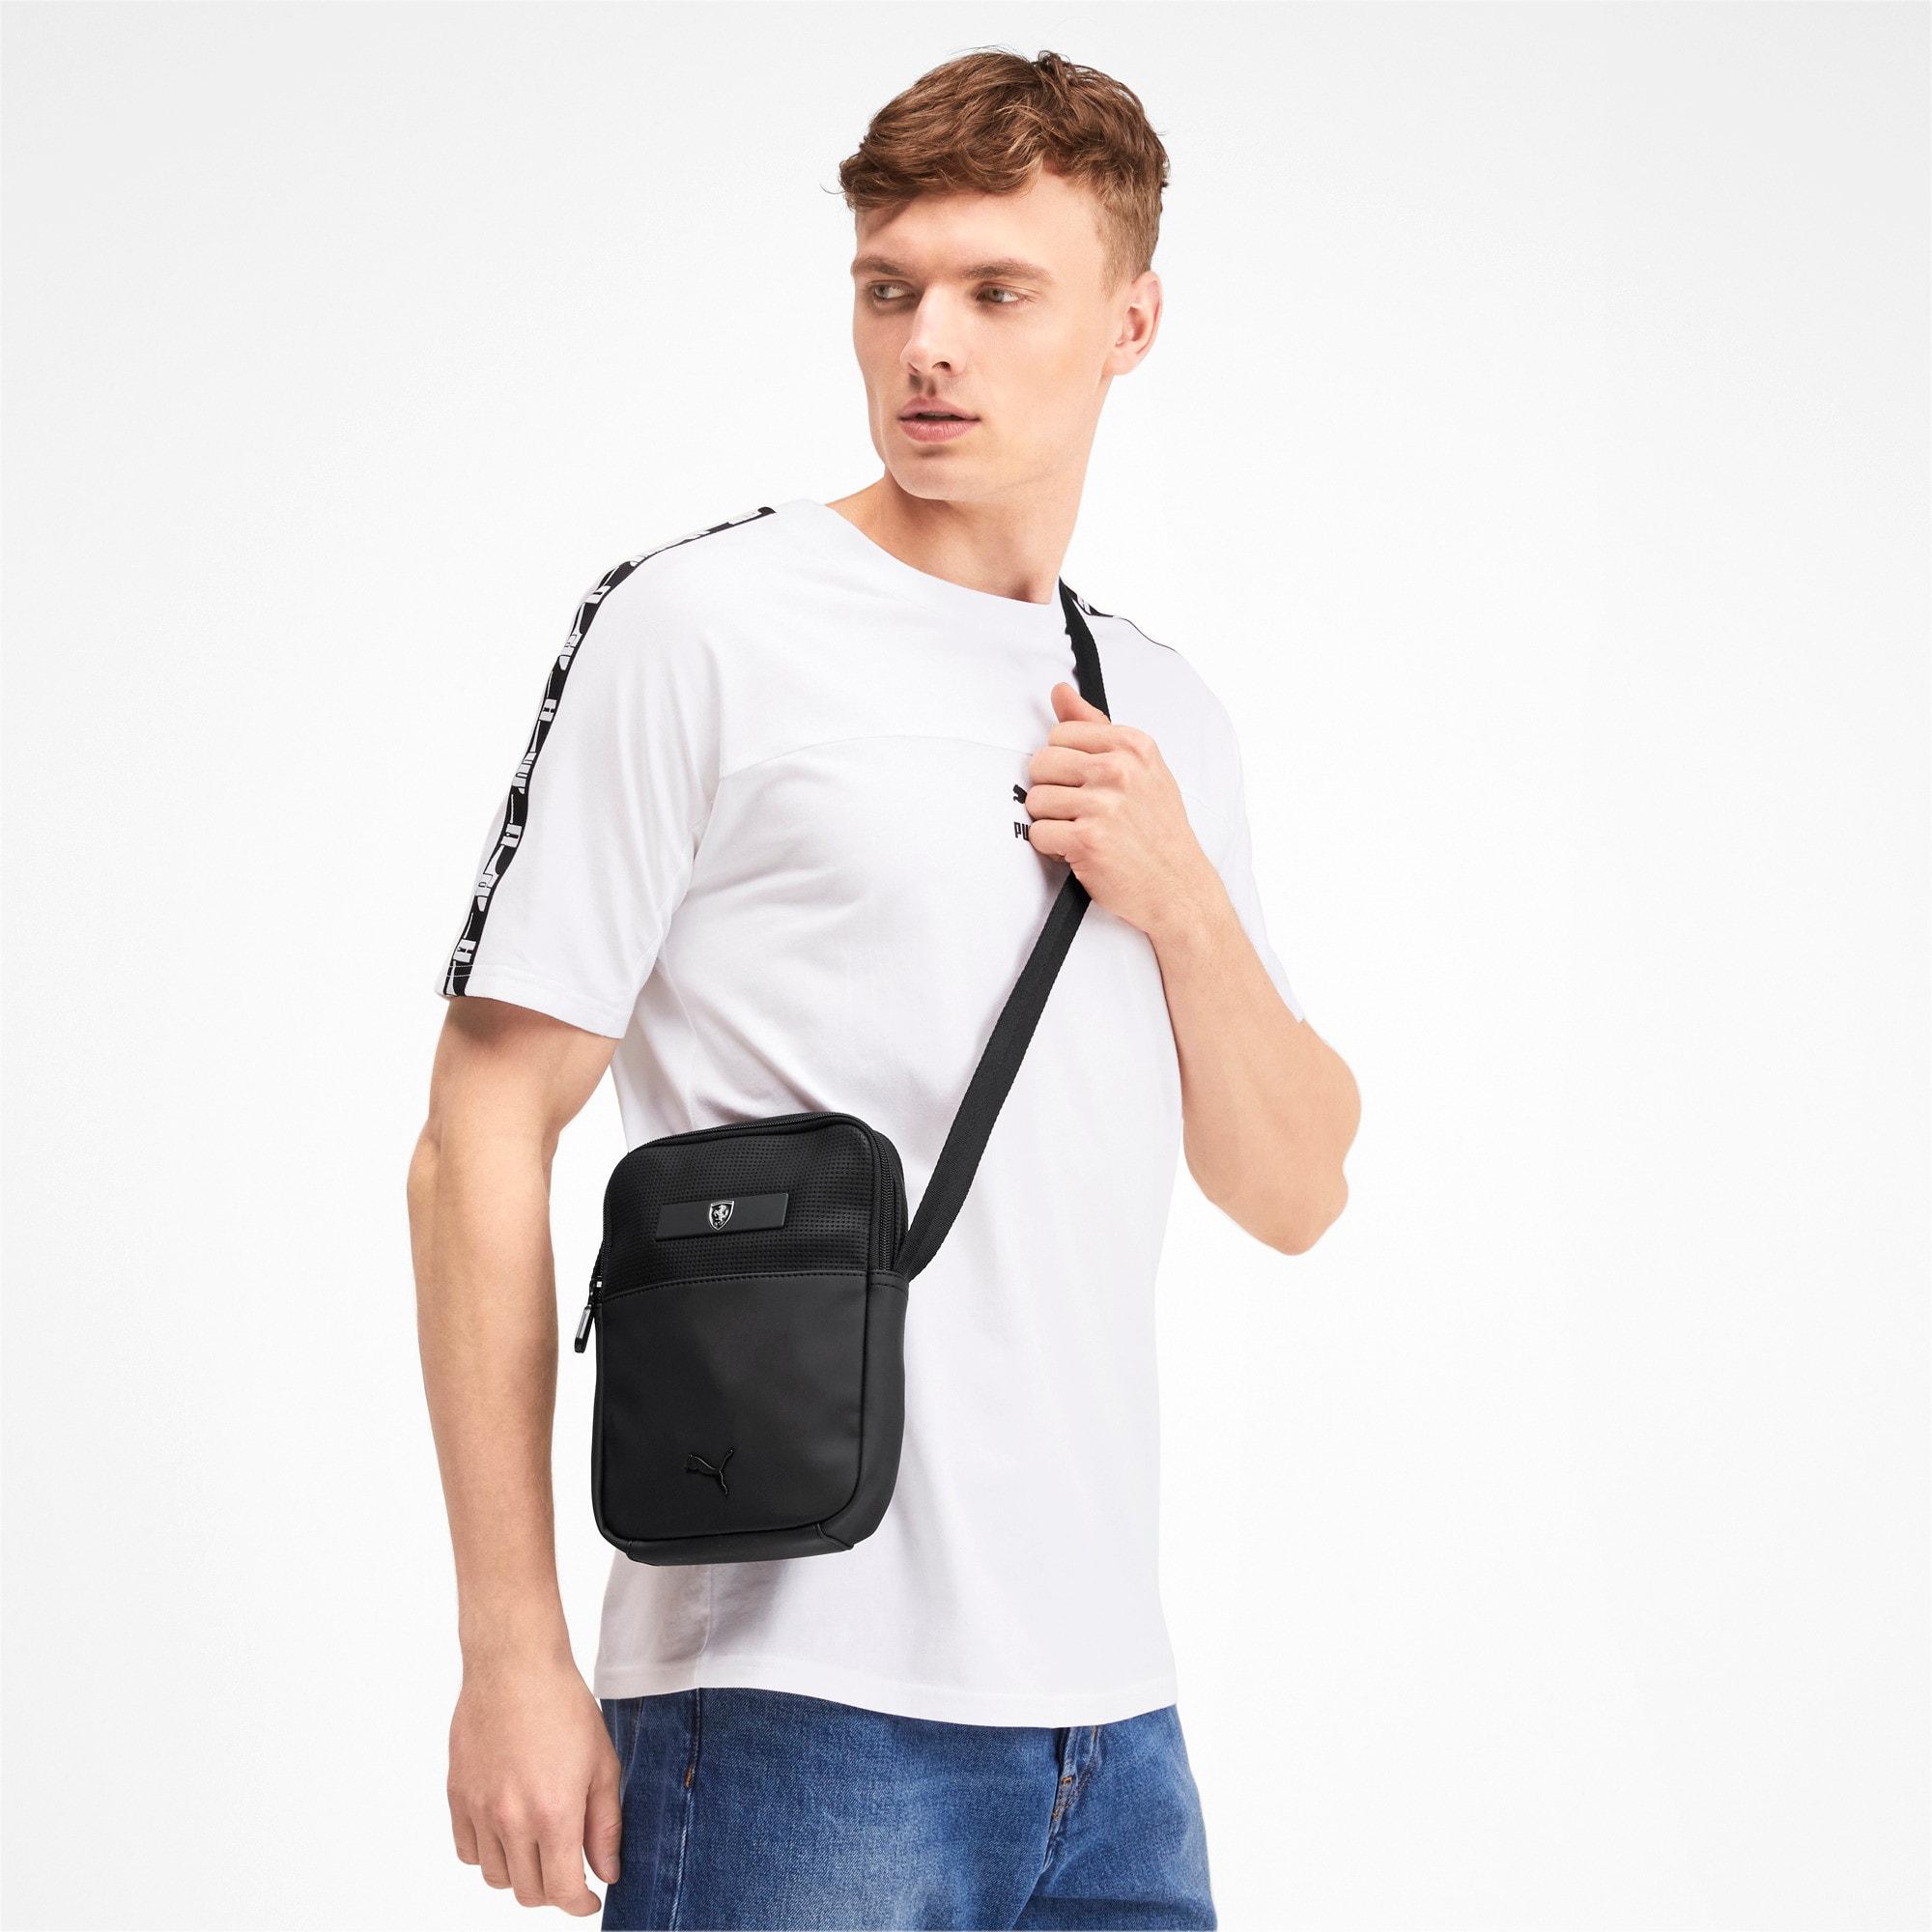 Thumbnail 2 of Ferrari Lifestyle Portable Bag, Puma Black, medium-IND